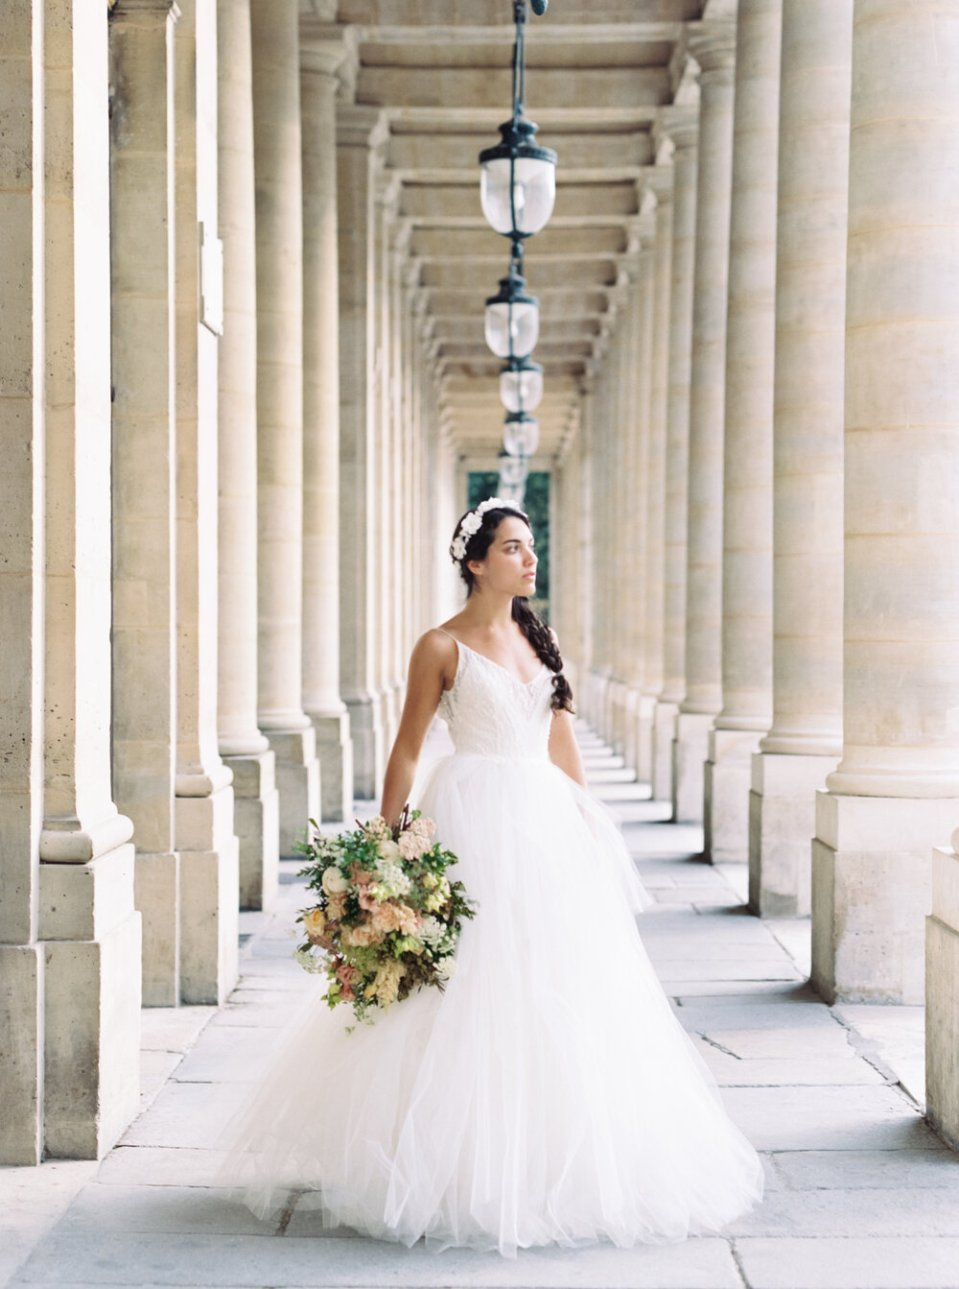 Paris Destination Wedding Fine Art Photography-12.jpg